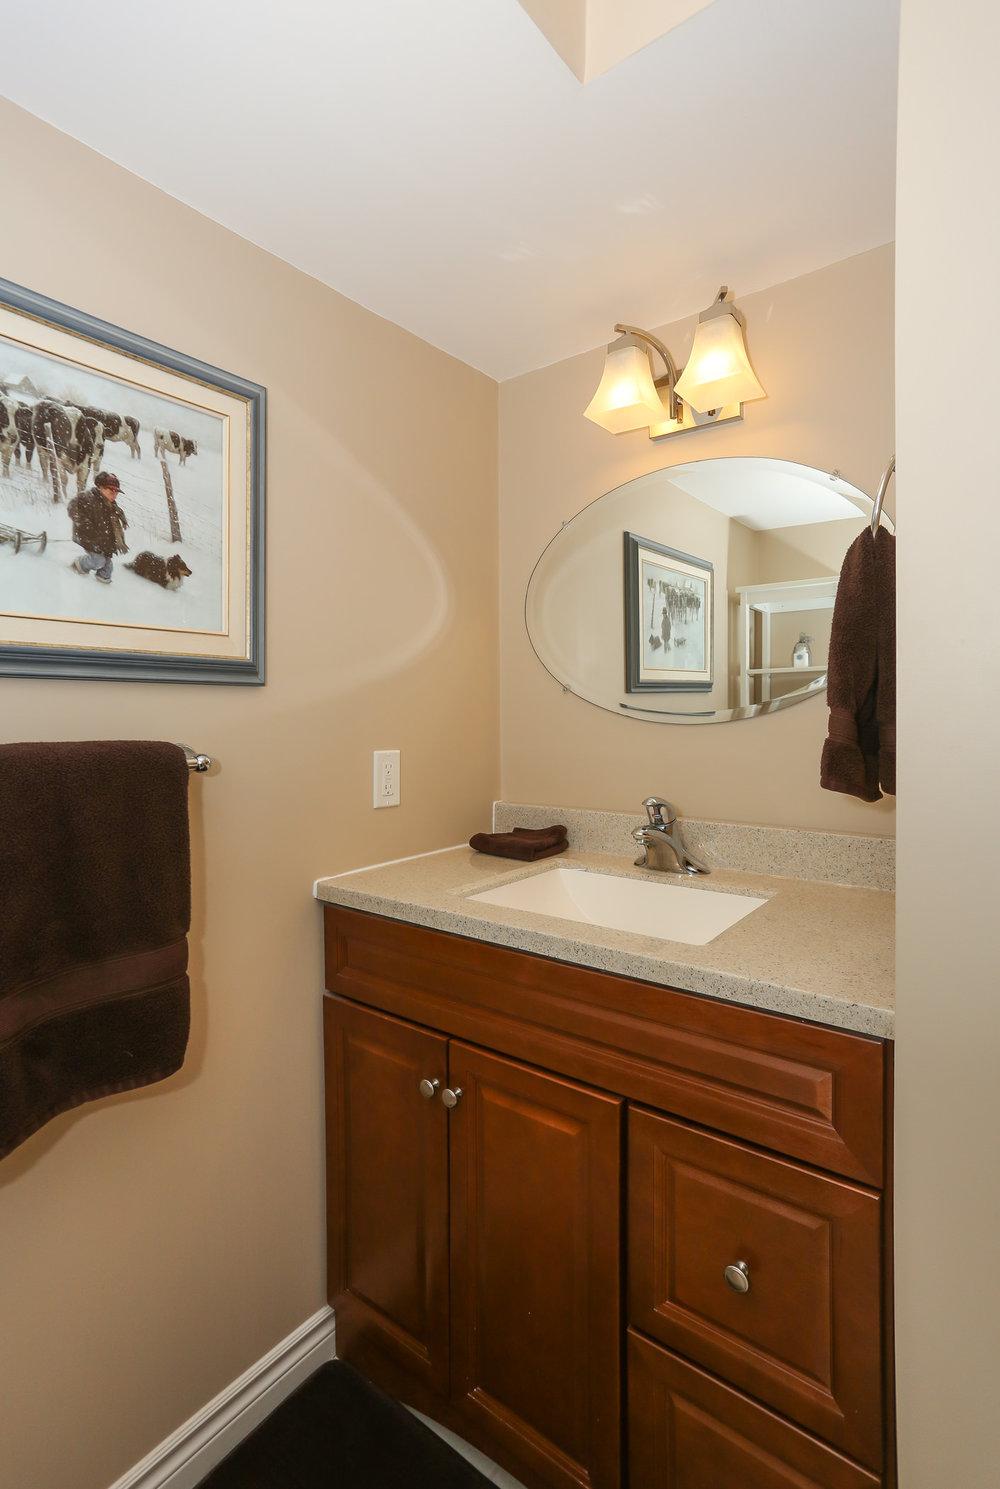 62 Bathroom.jpg